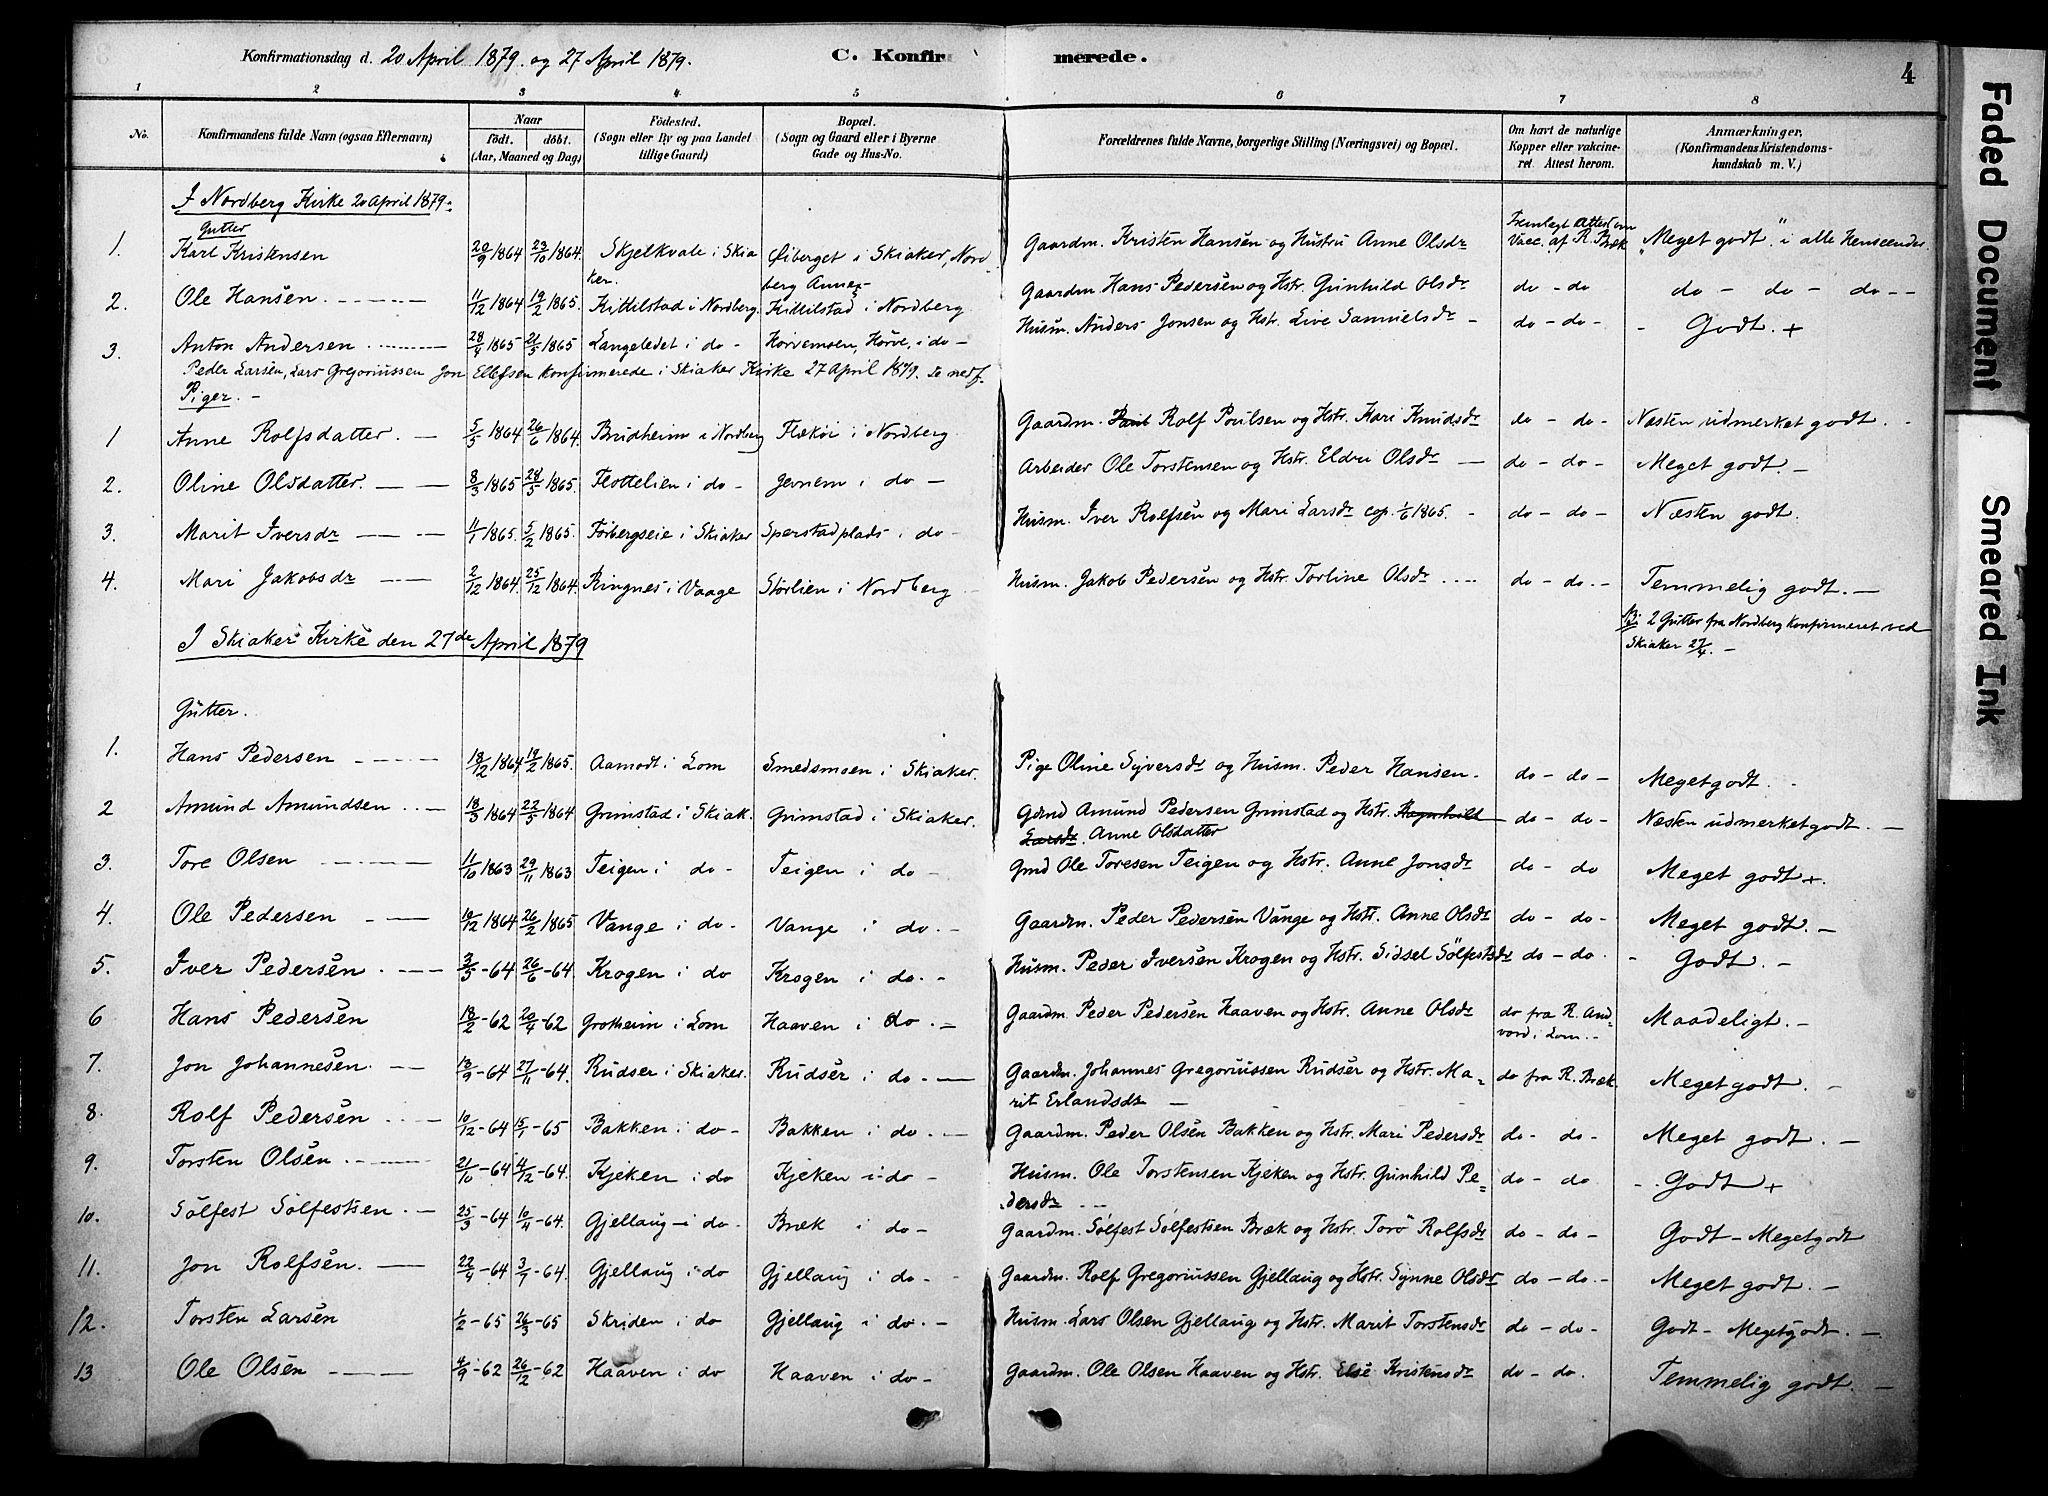 SAH, Skjåk prestekontor, Ministerialbok nr. 2, 1878-1907, s. 4